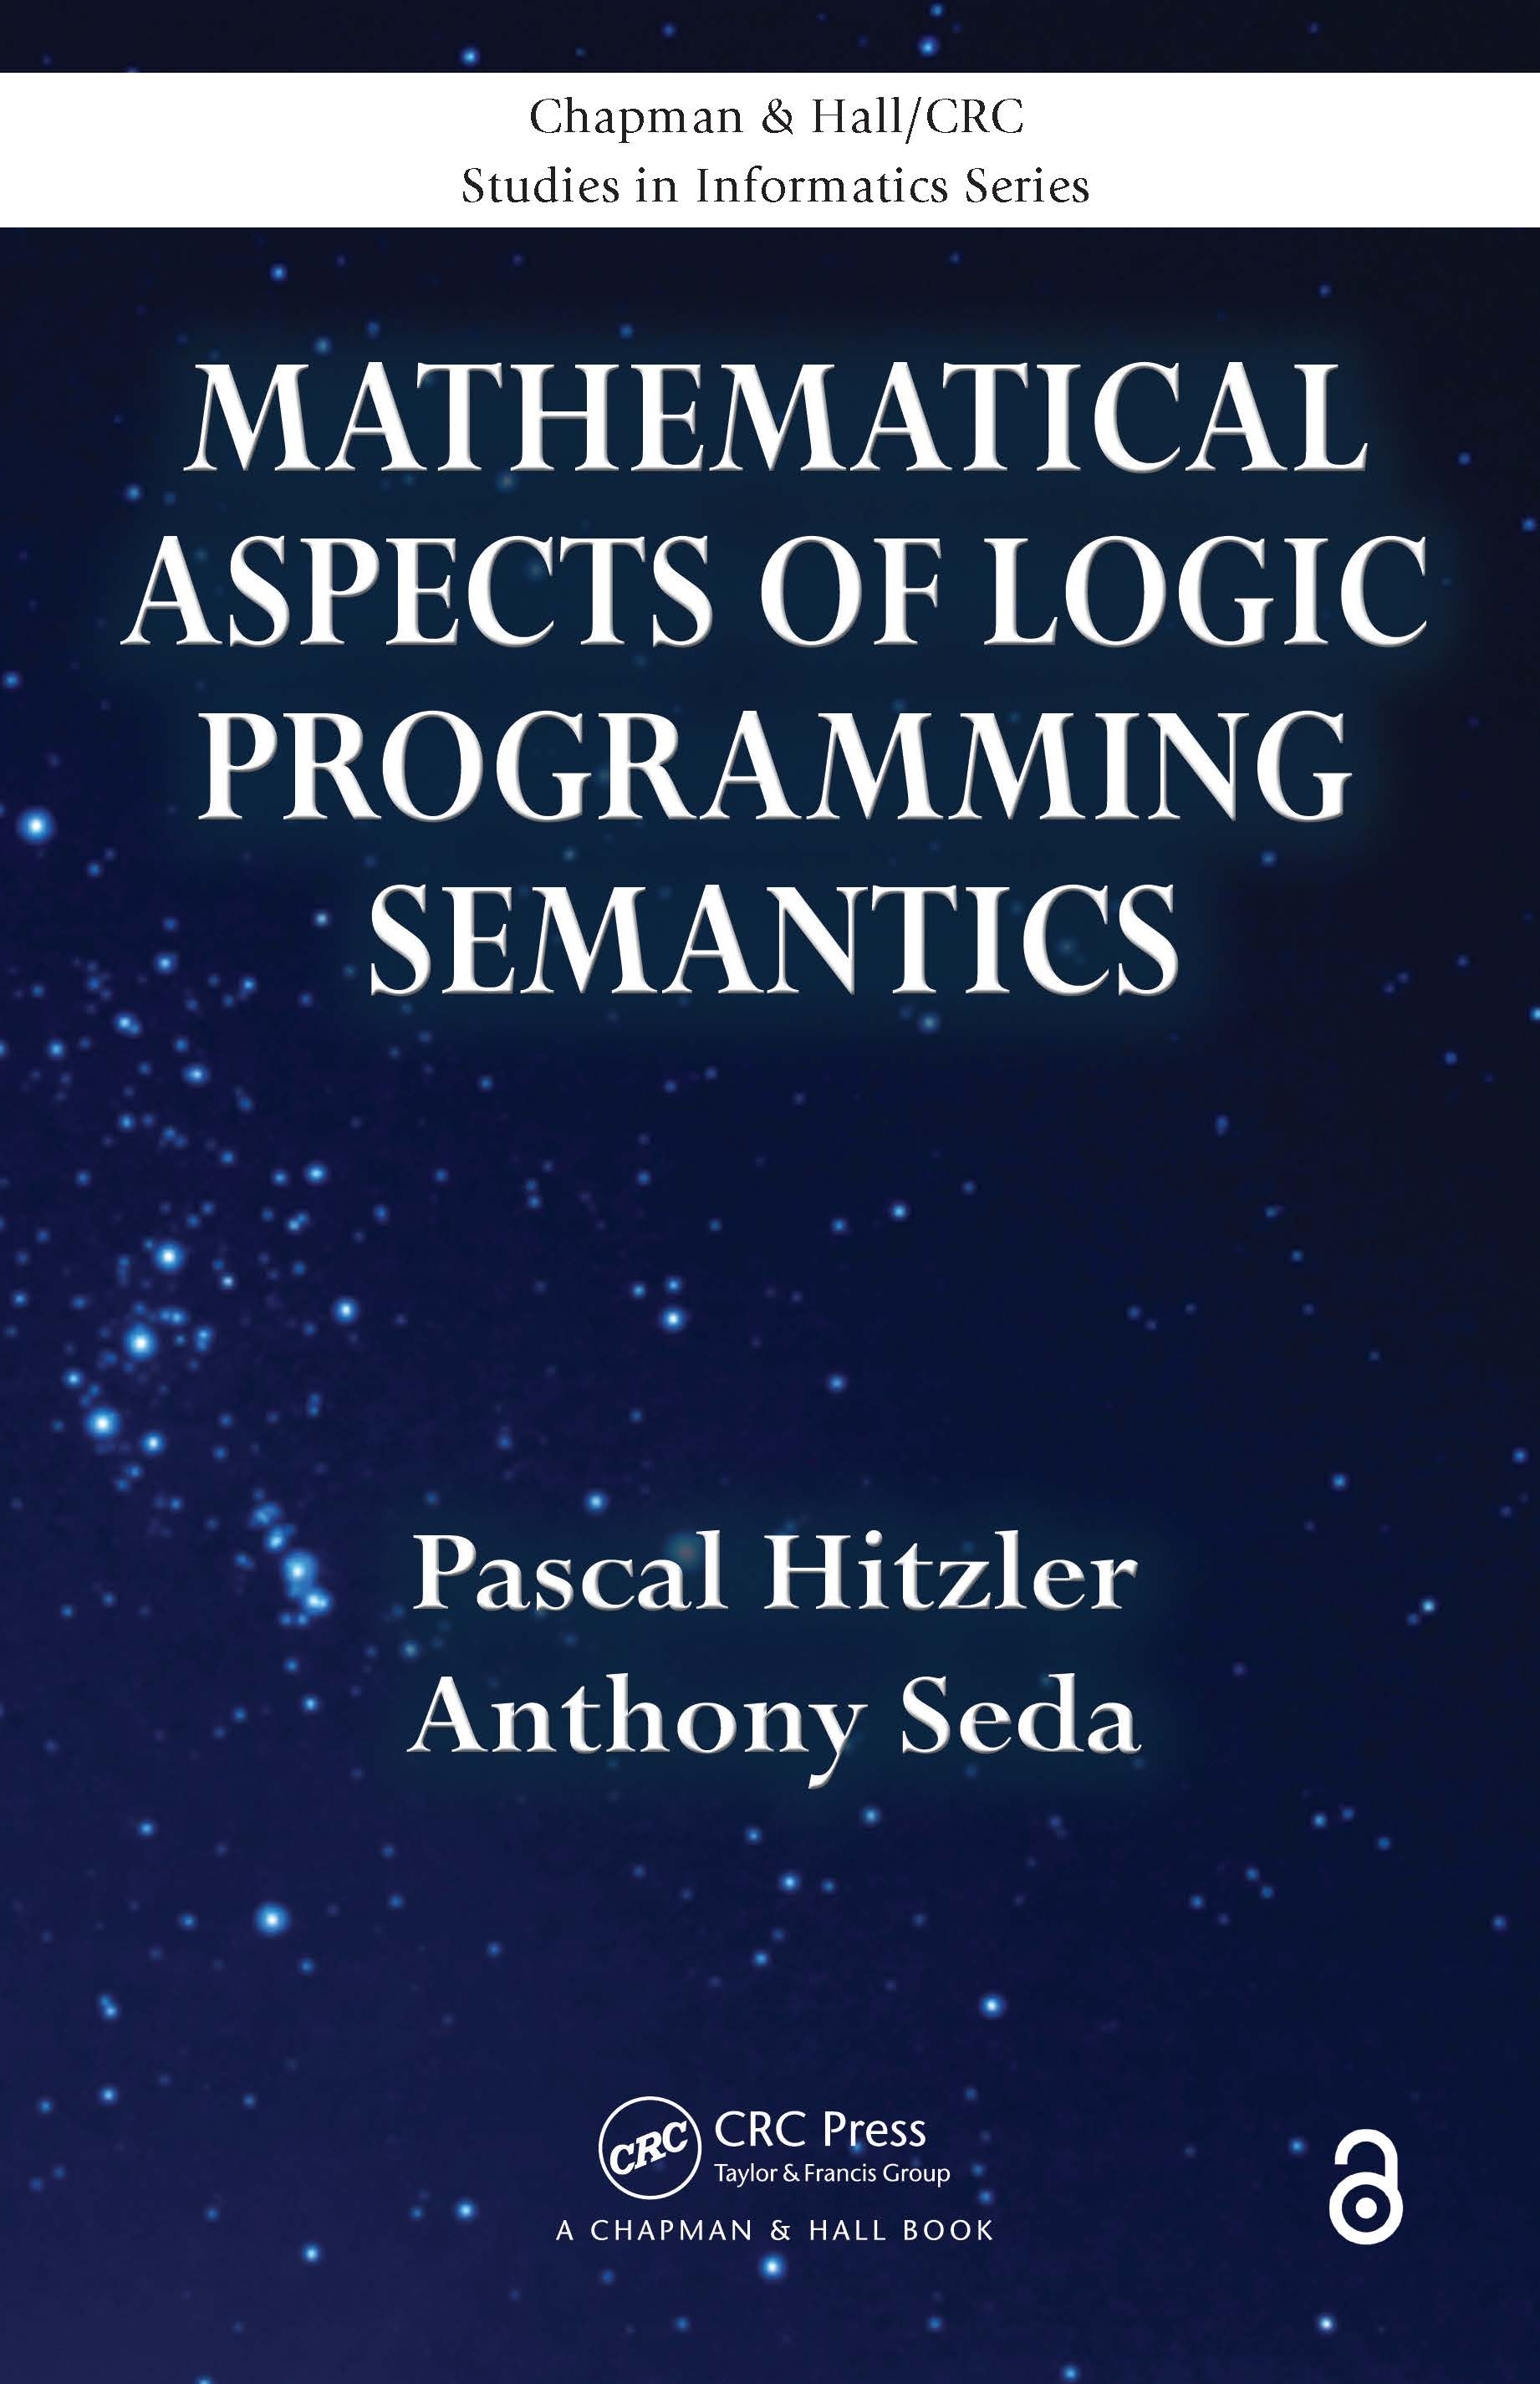 Mathematical Aspects of Logic Programming Semantics book cover